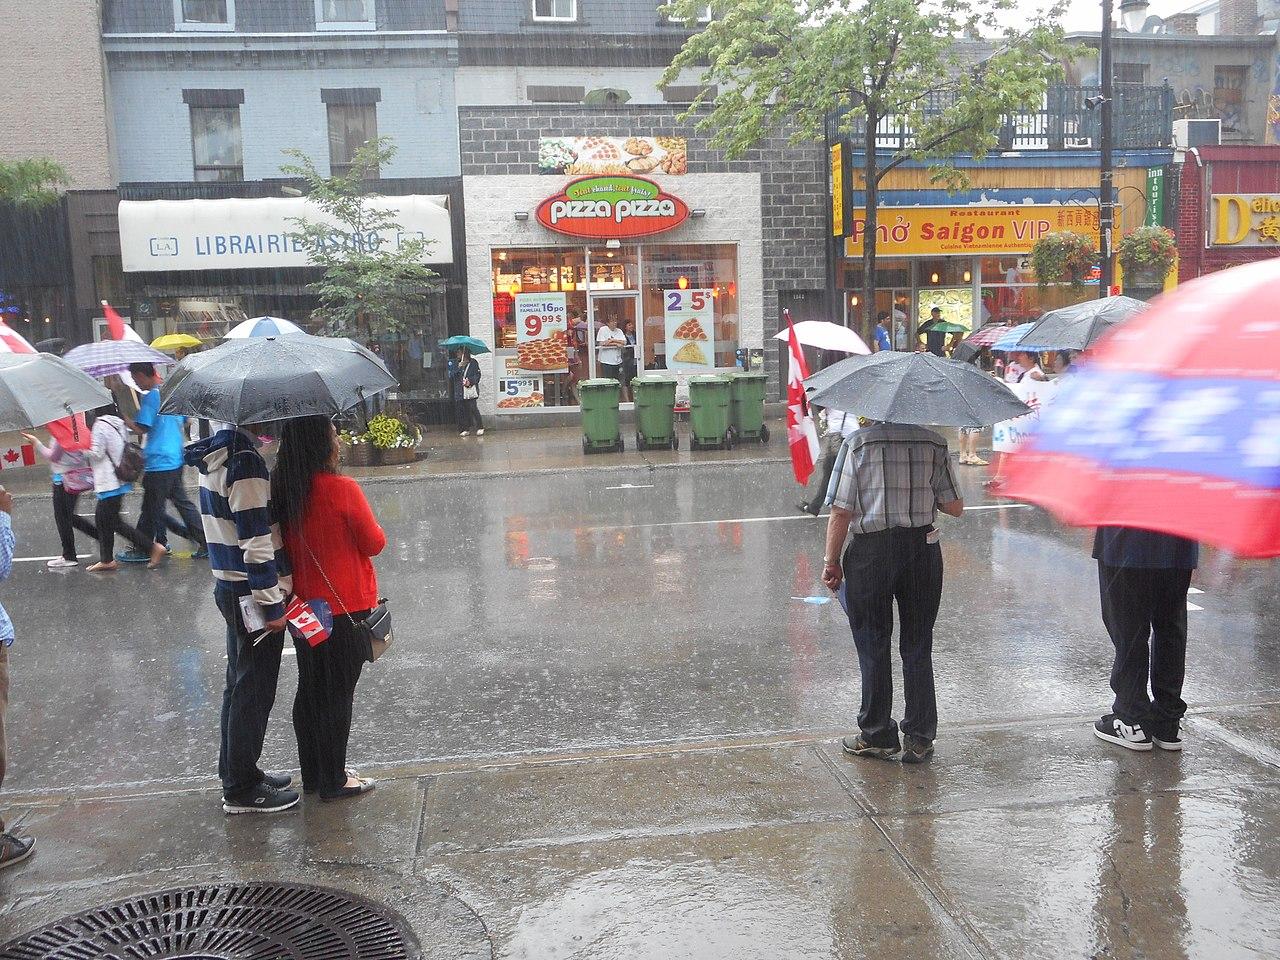 File:Canada Day 2015 on Saint Catherine Street - 345.jpg - Wikimedia